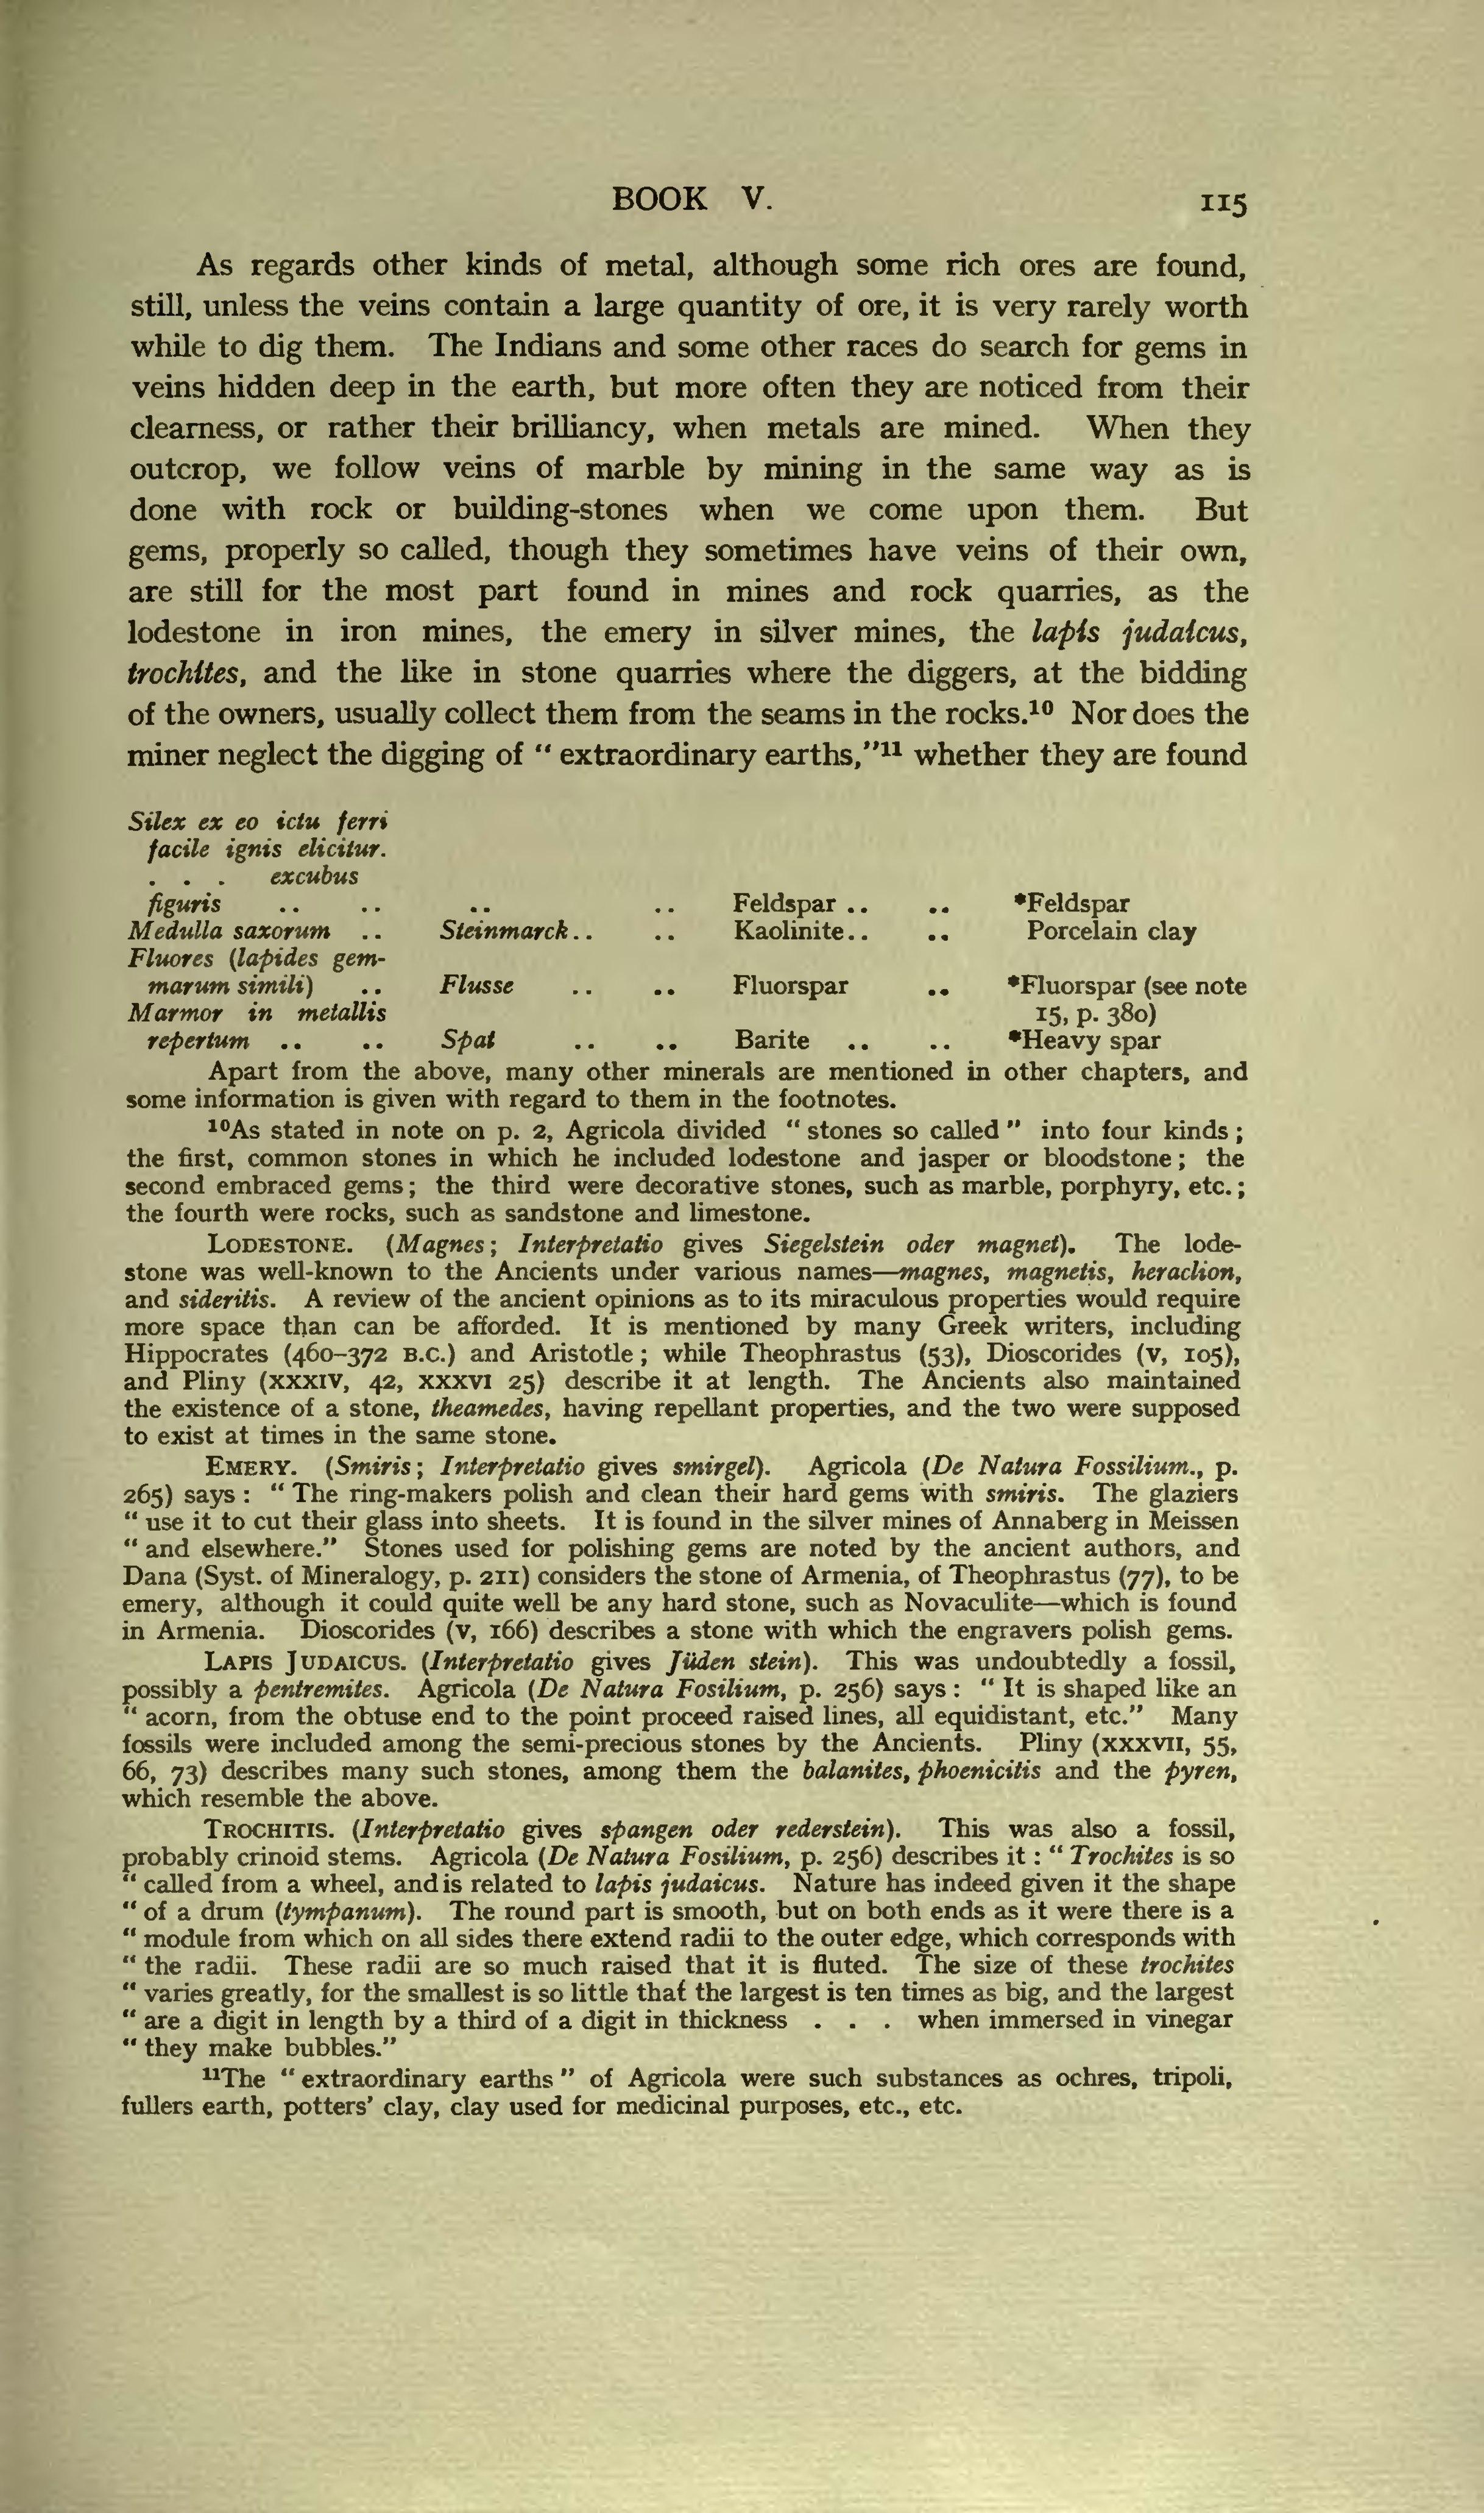 page de re metallica  1912  djvu  157